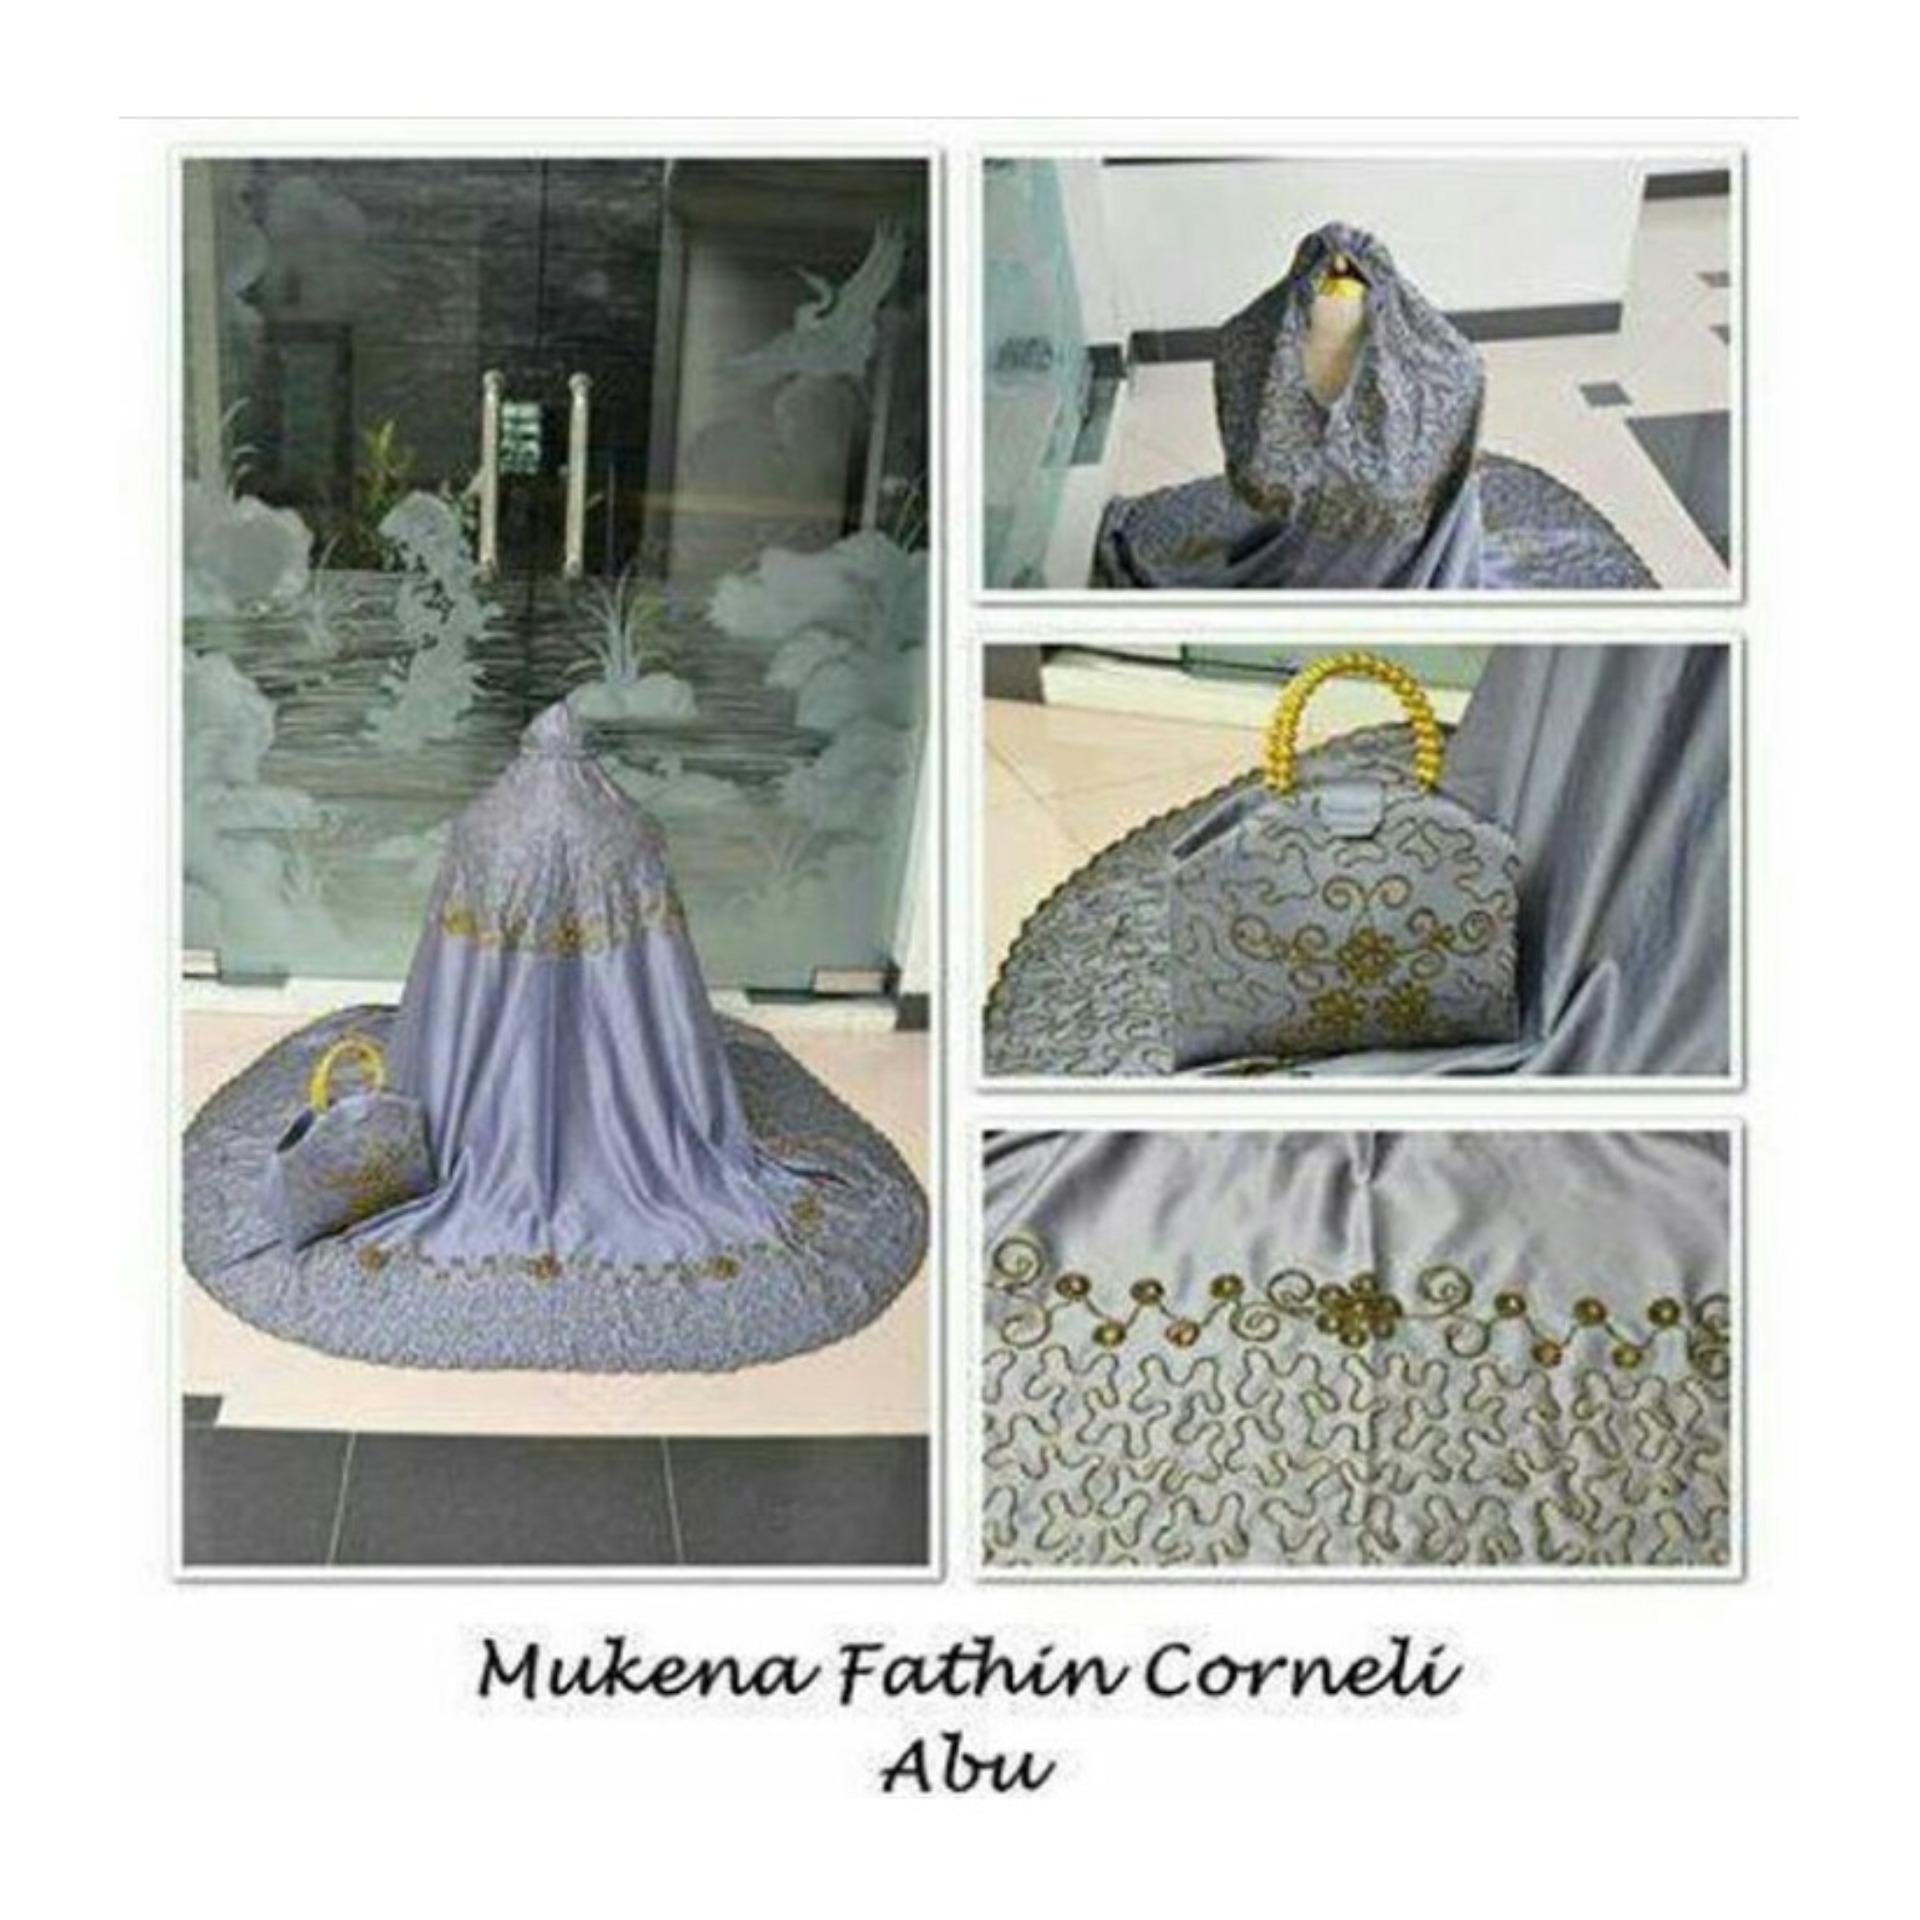 Spesifikasi Abangsky Stelan Mukena Fathin Corneli Abu Tas Mutiara Online